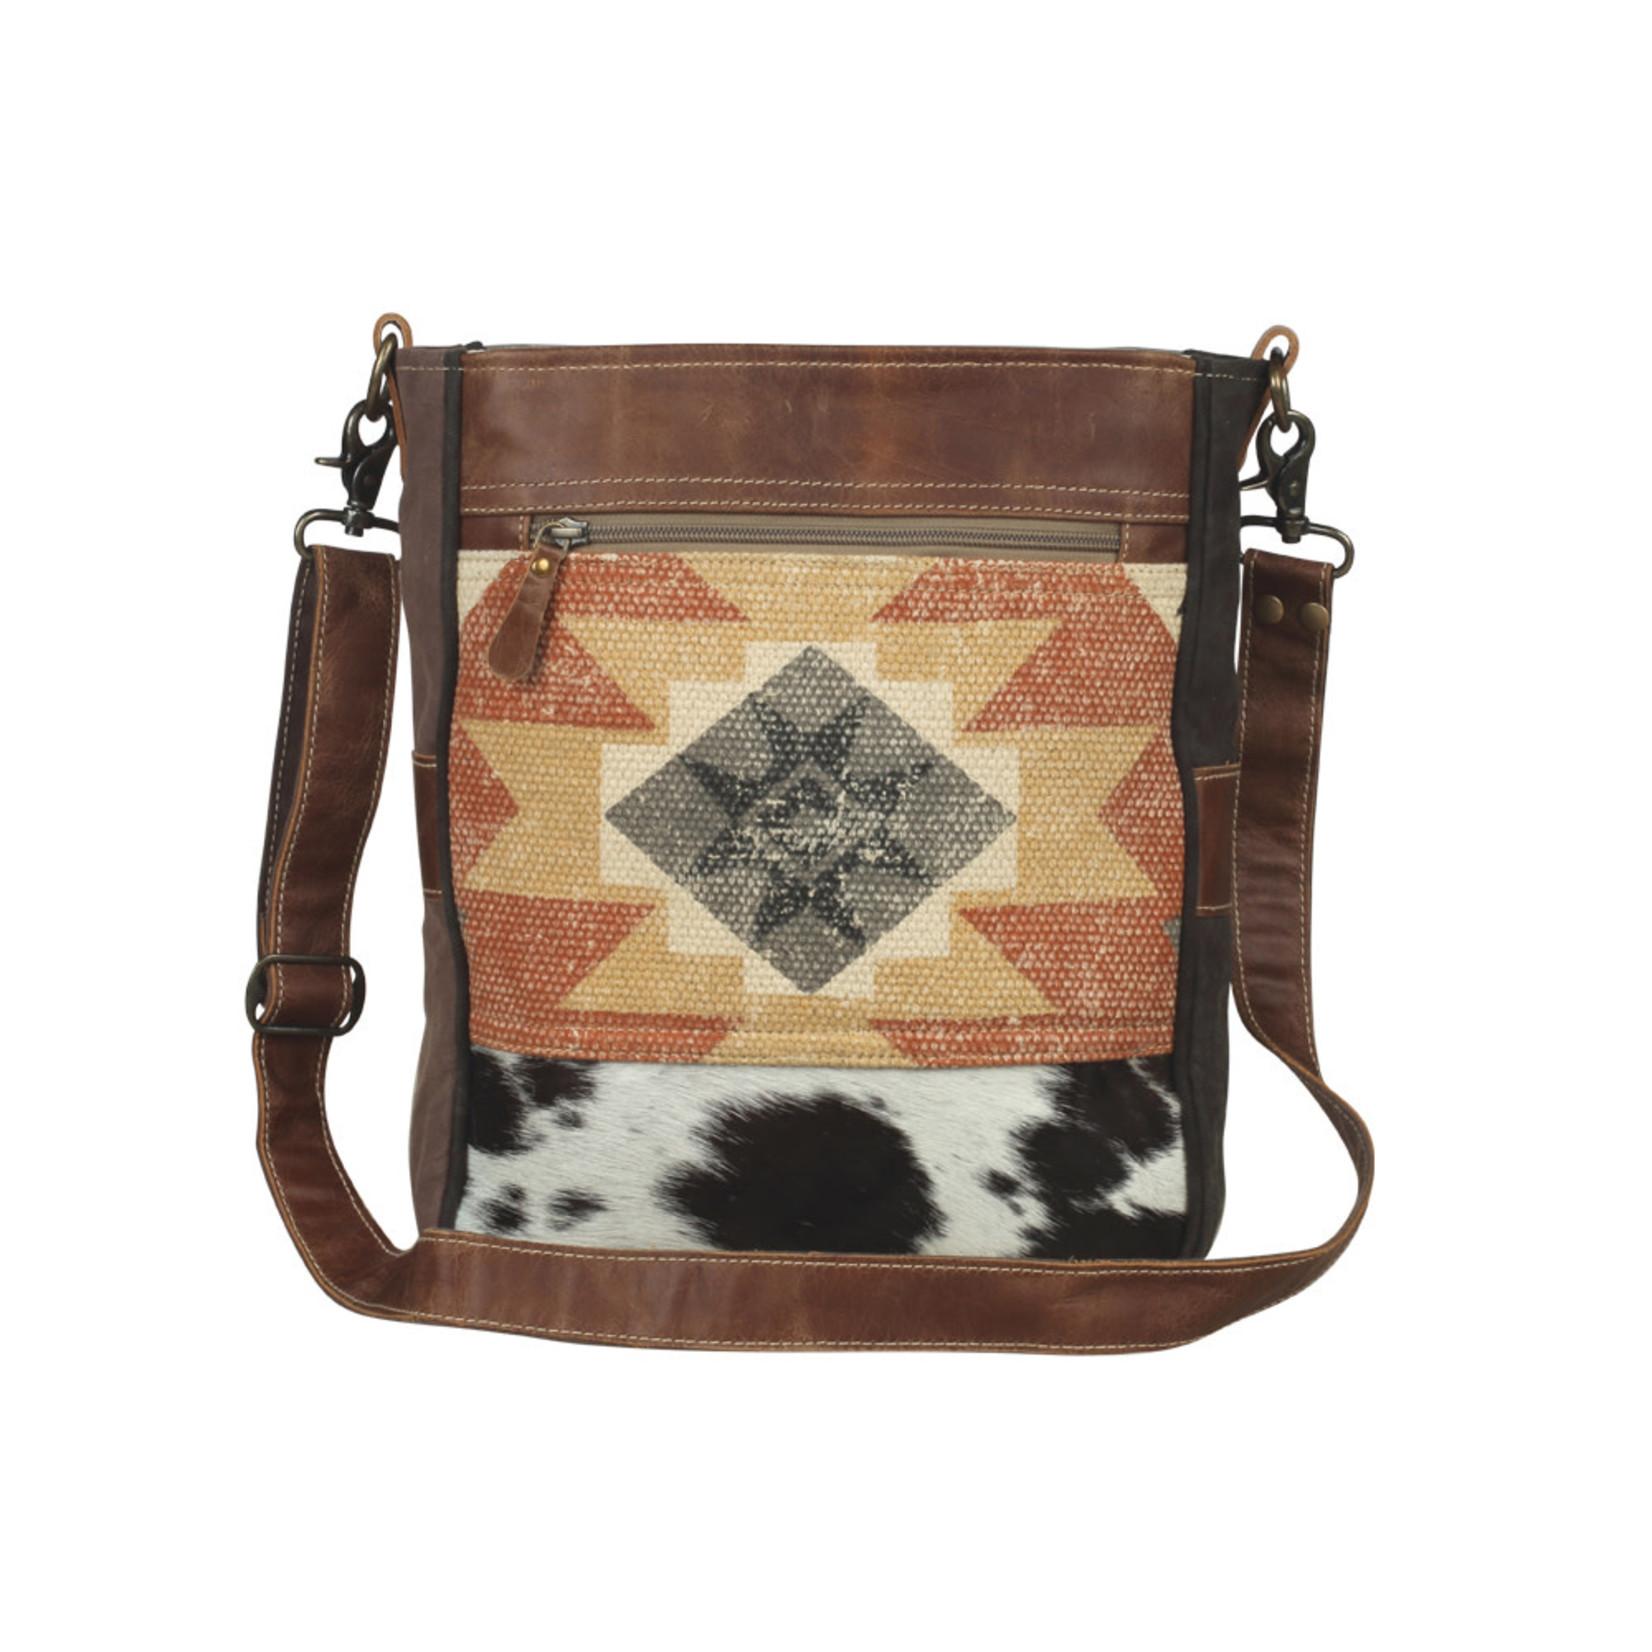 Myra Bags S-2085 Enchanting Shoulder Bag